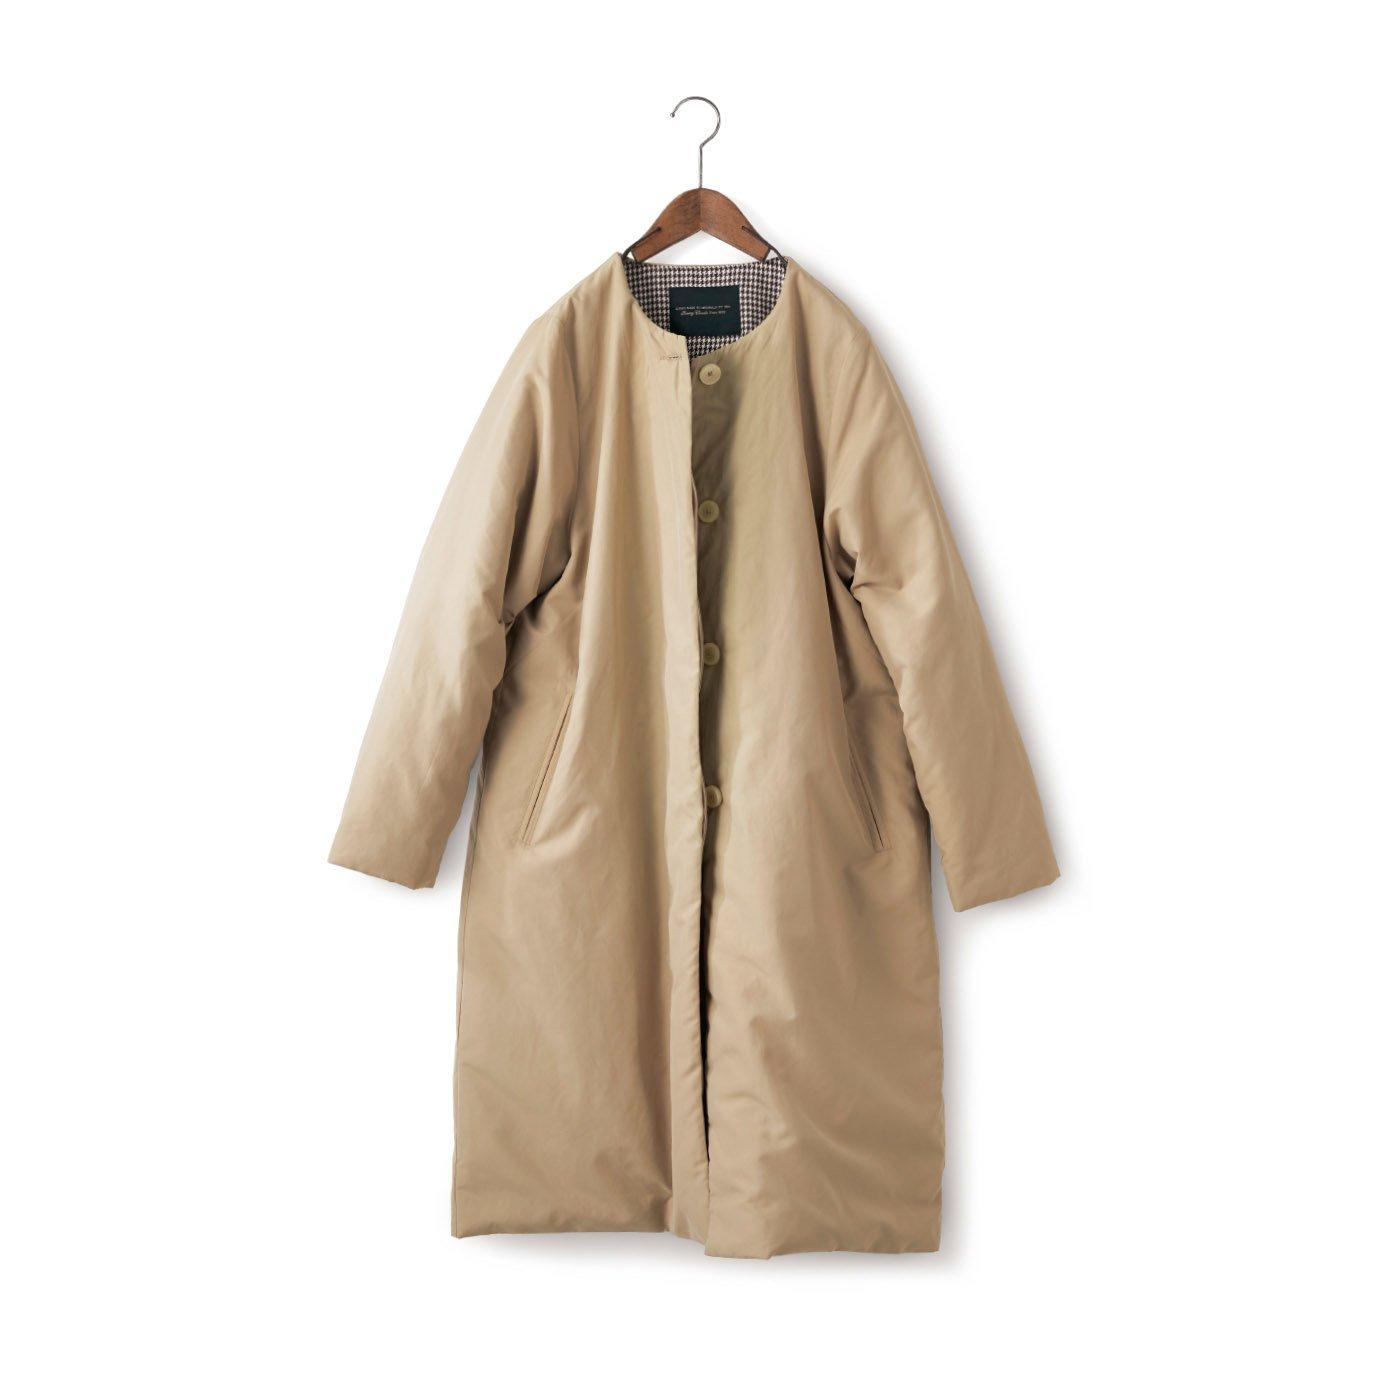 SUNNY CLOUDS 極軽ダウンコート〈レディース〉